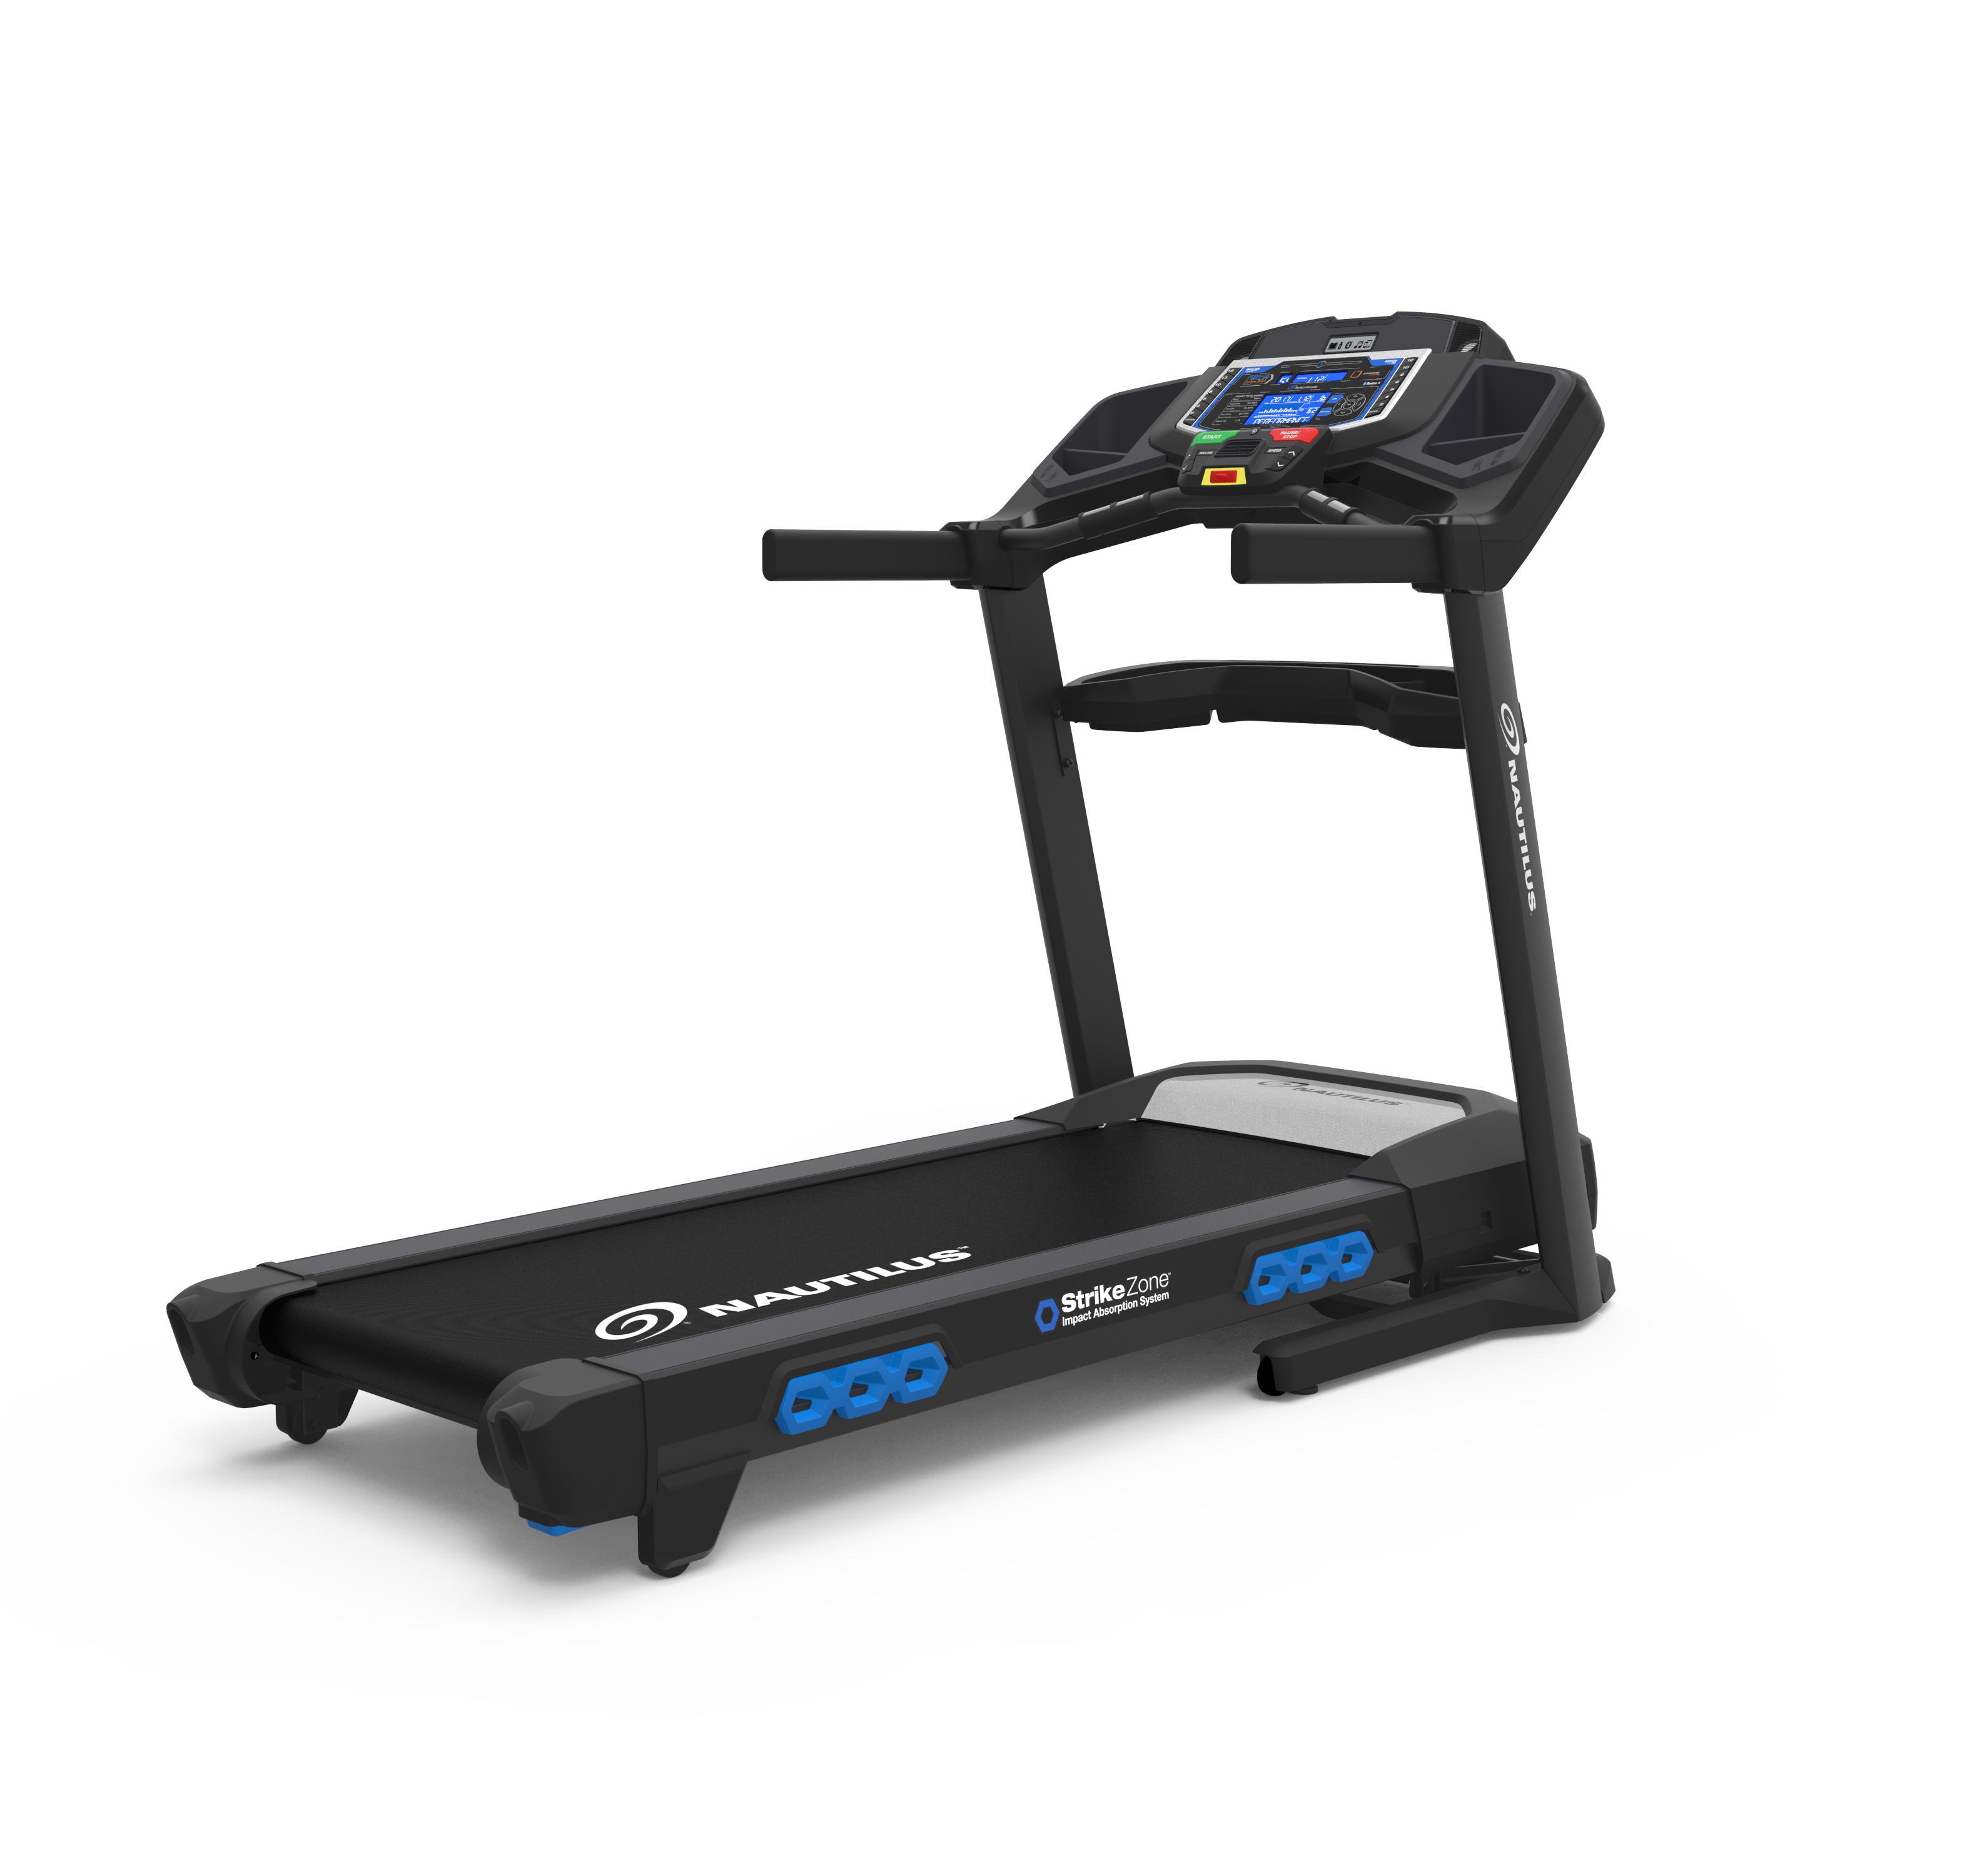 941ac6e3f16 Ηλεκτρικός Διάδρομος Nautilus® T626 – Nautilus USA   Όργανα Γυμναστικής